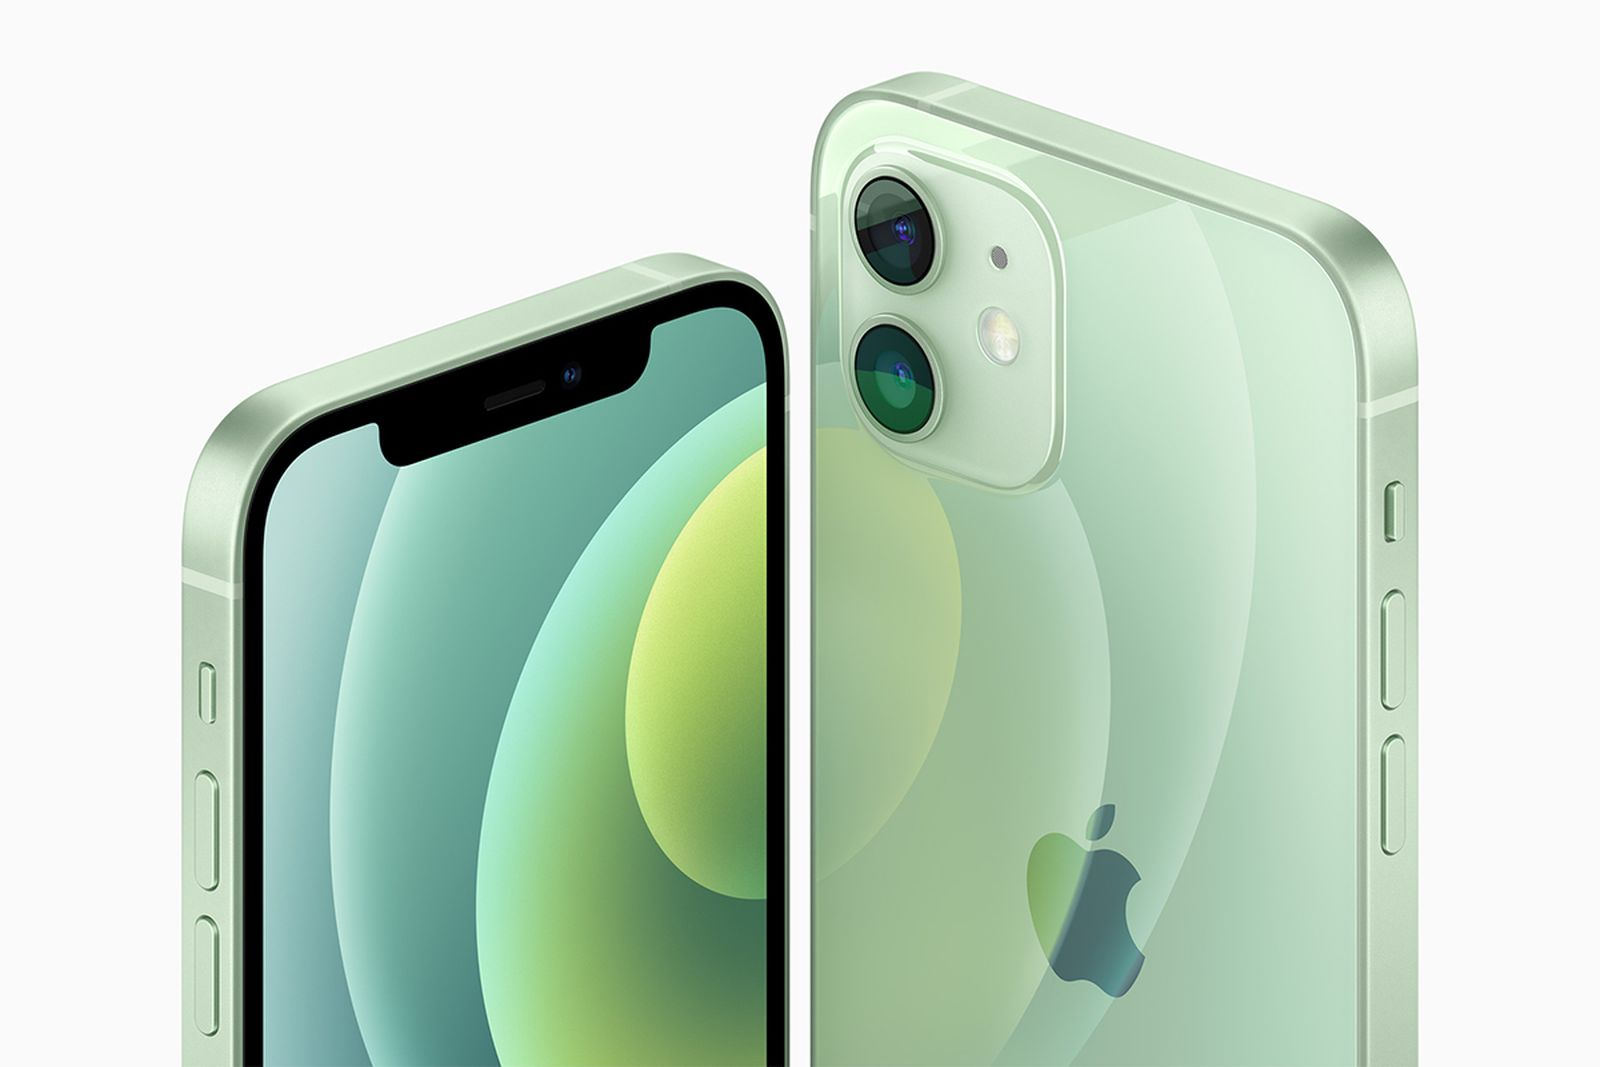 apple-iphone-12-release-date-price-05